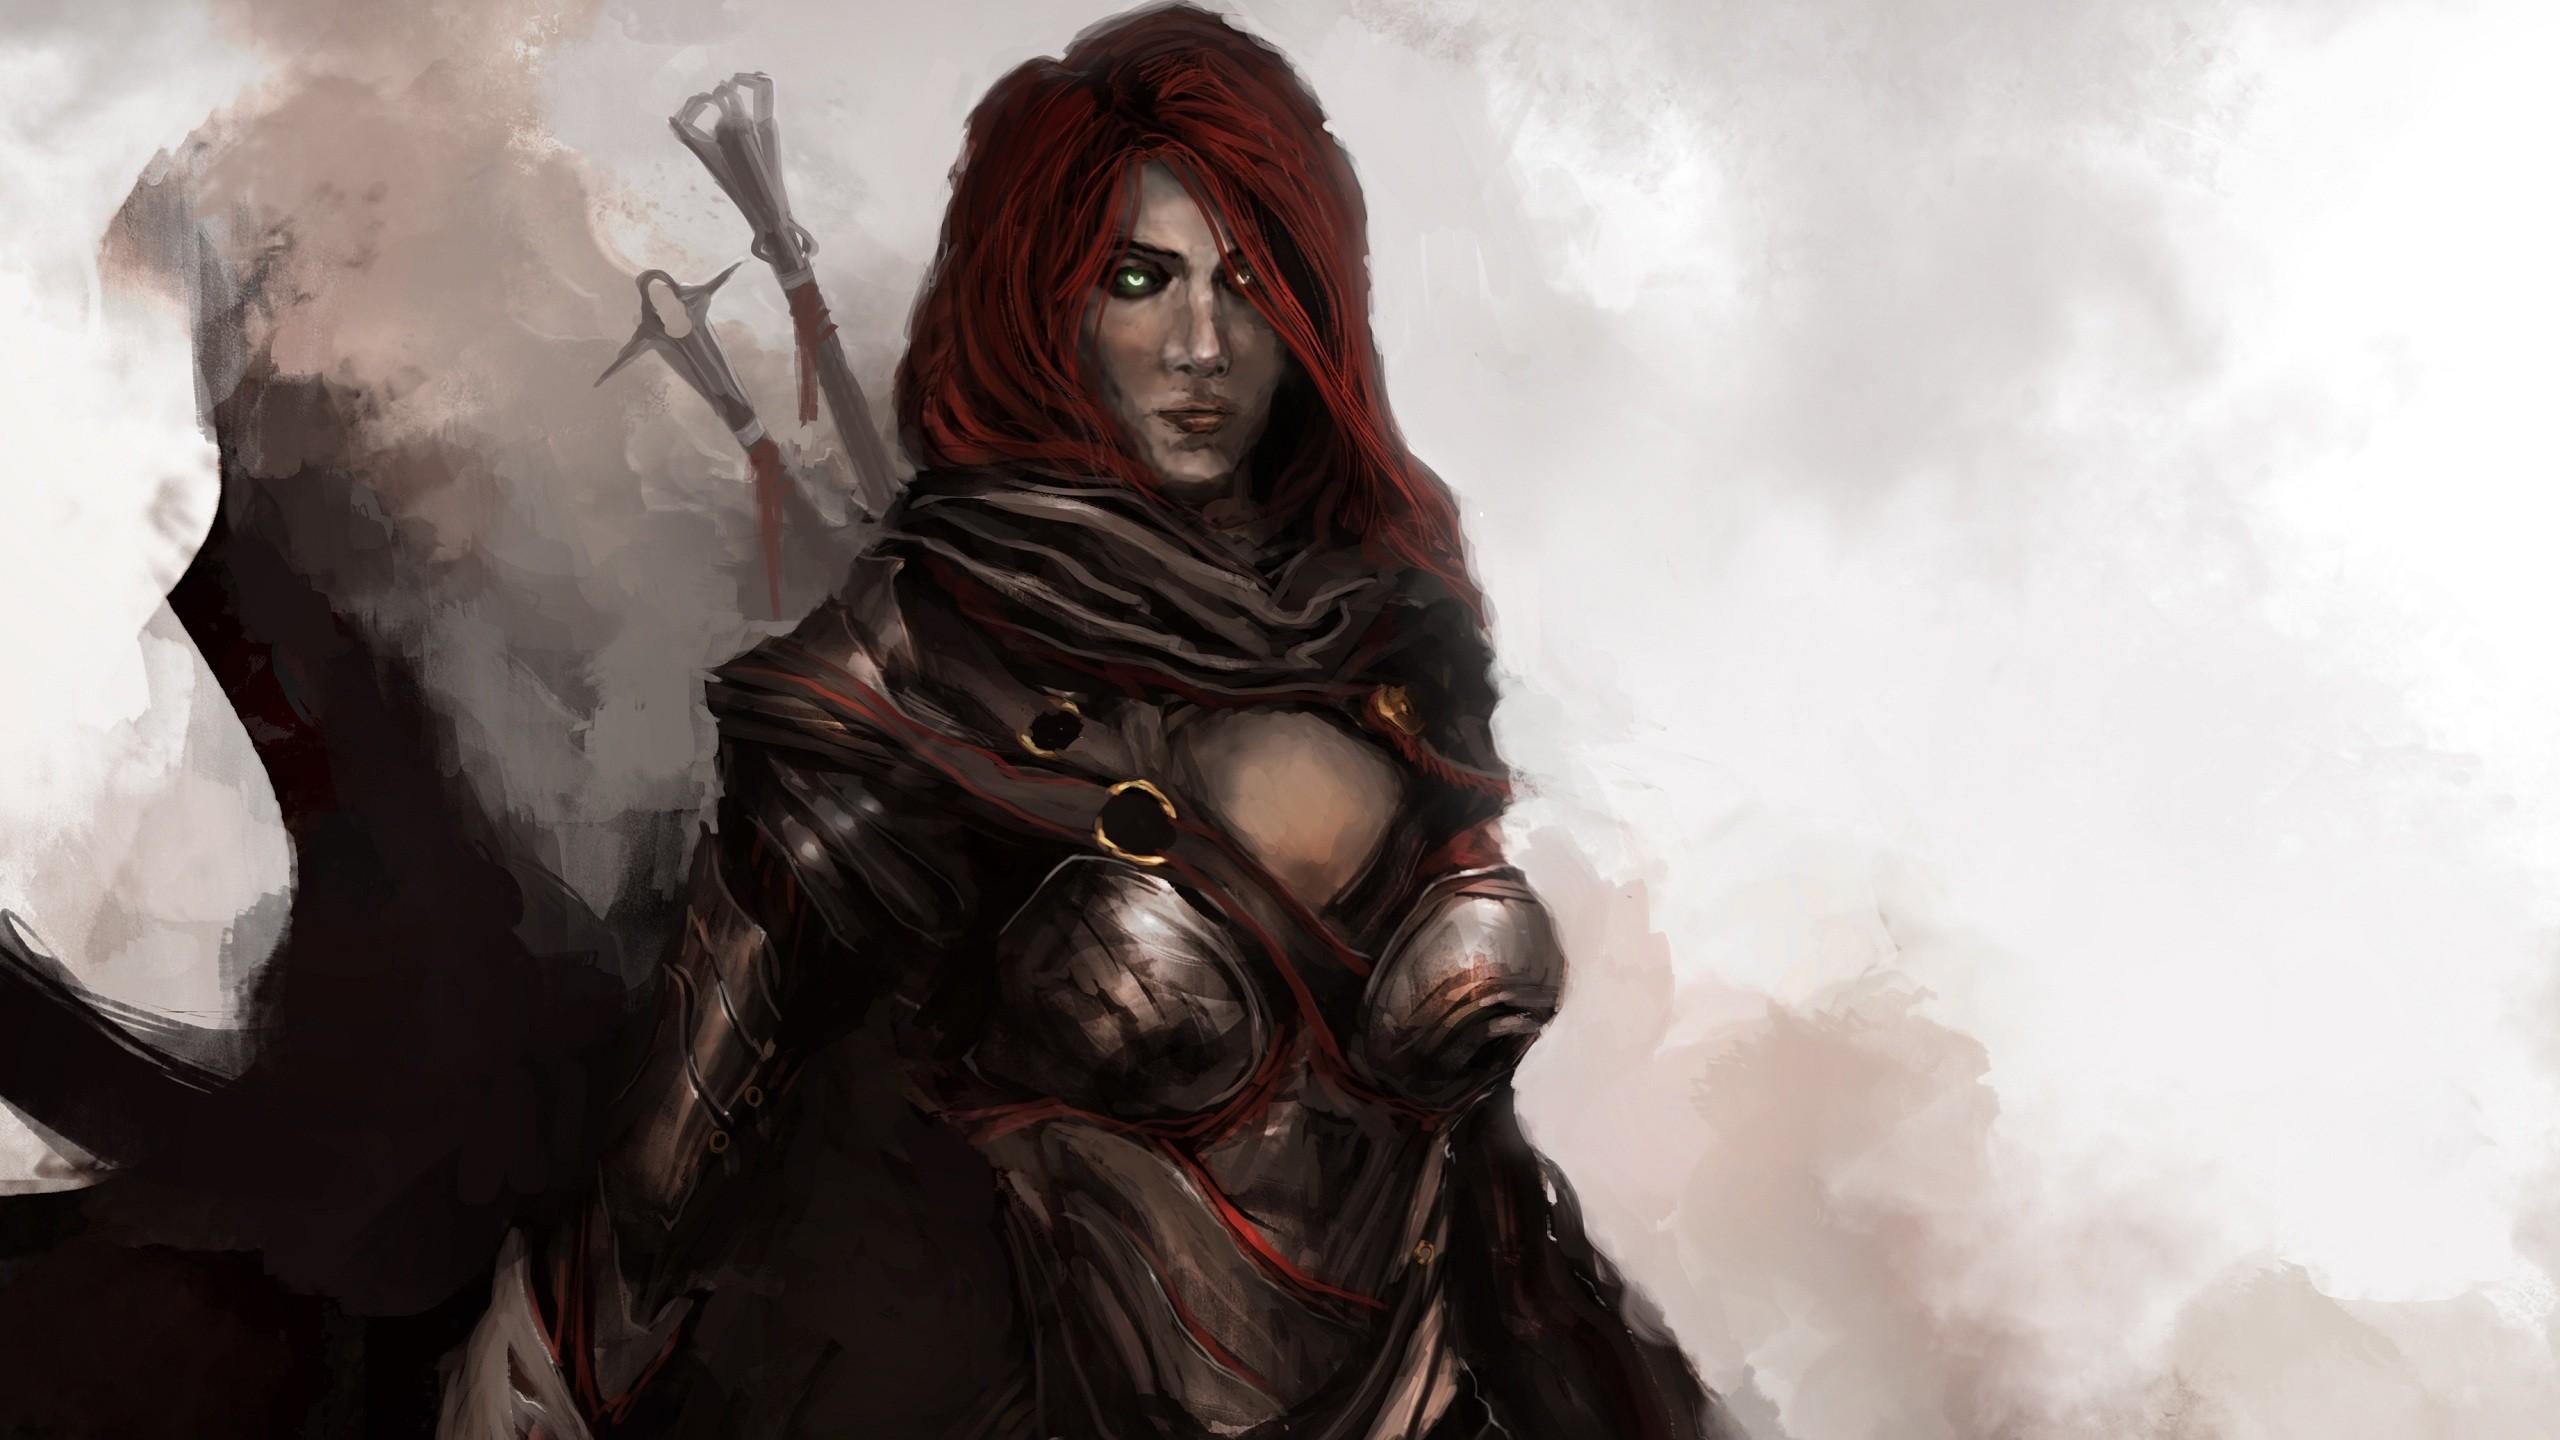 Black Widow HD Wallpaper | Background Image | 2560x1440 | ID